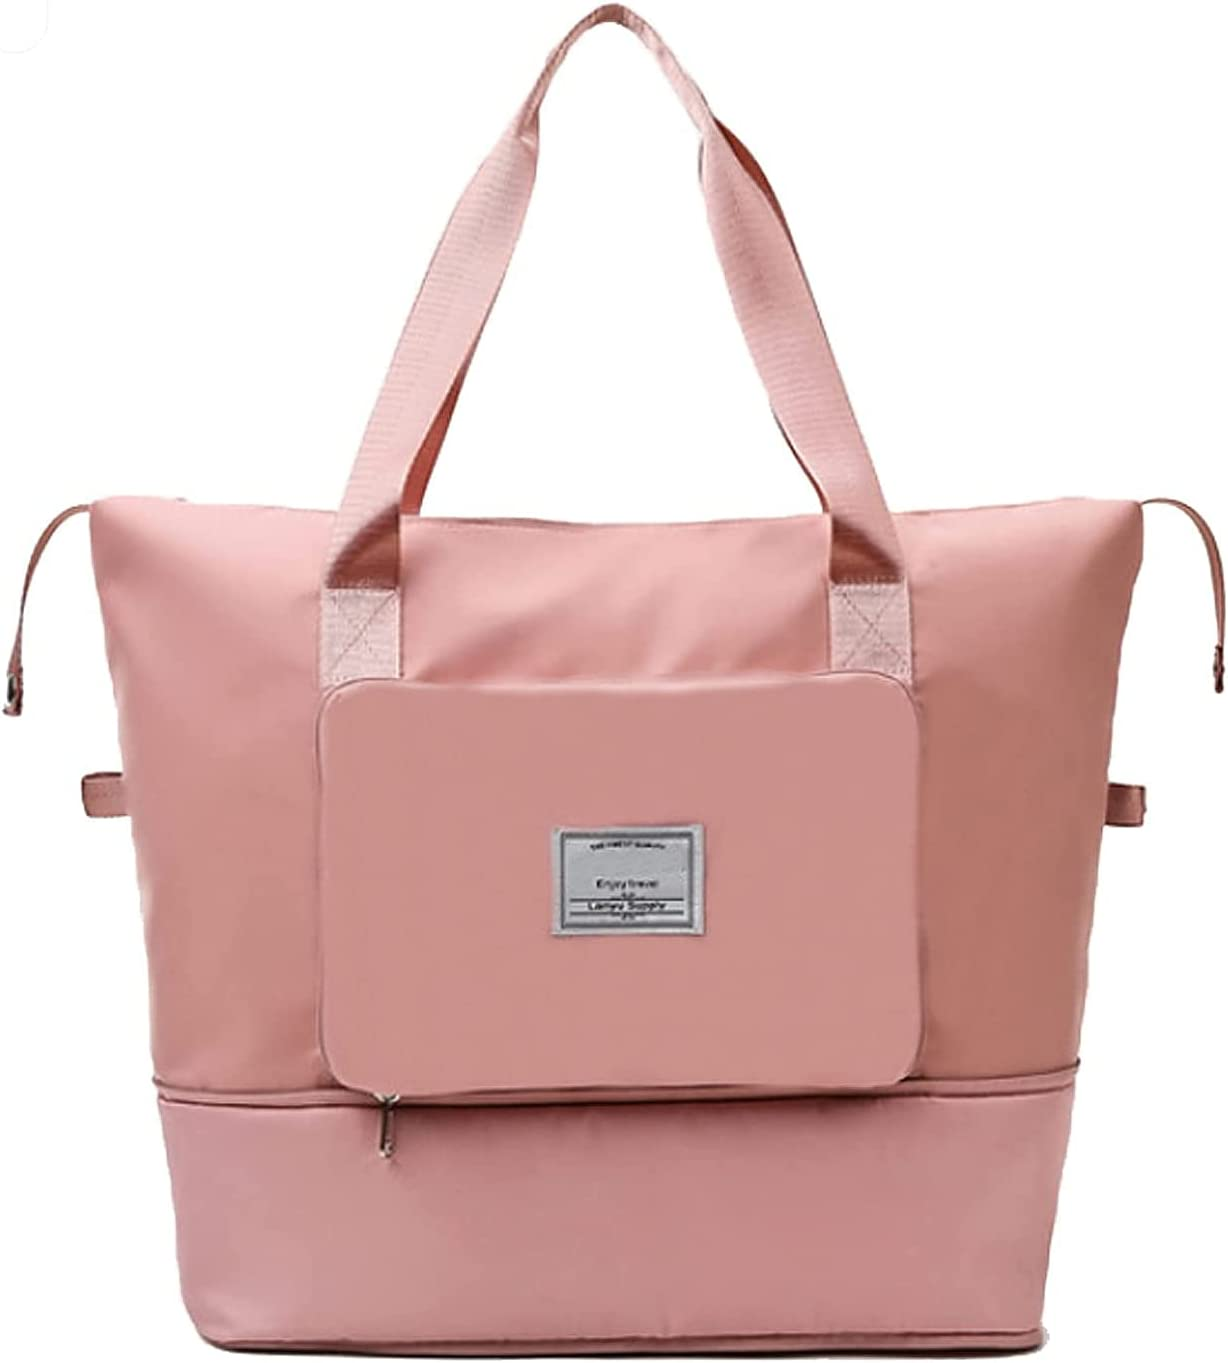 Large Capacity Folding Arlington Mall Travel Manufacturer regenerated product Portable Waterproo Bag Lightweight